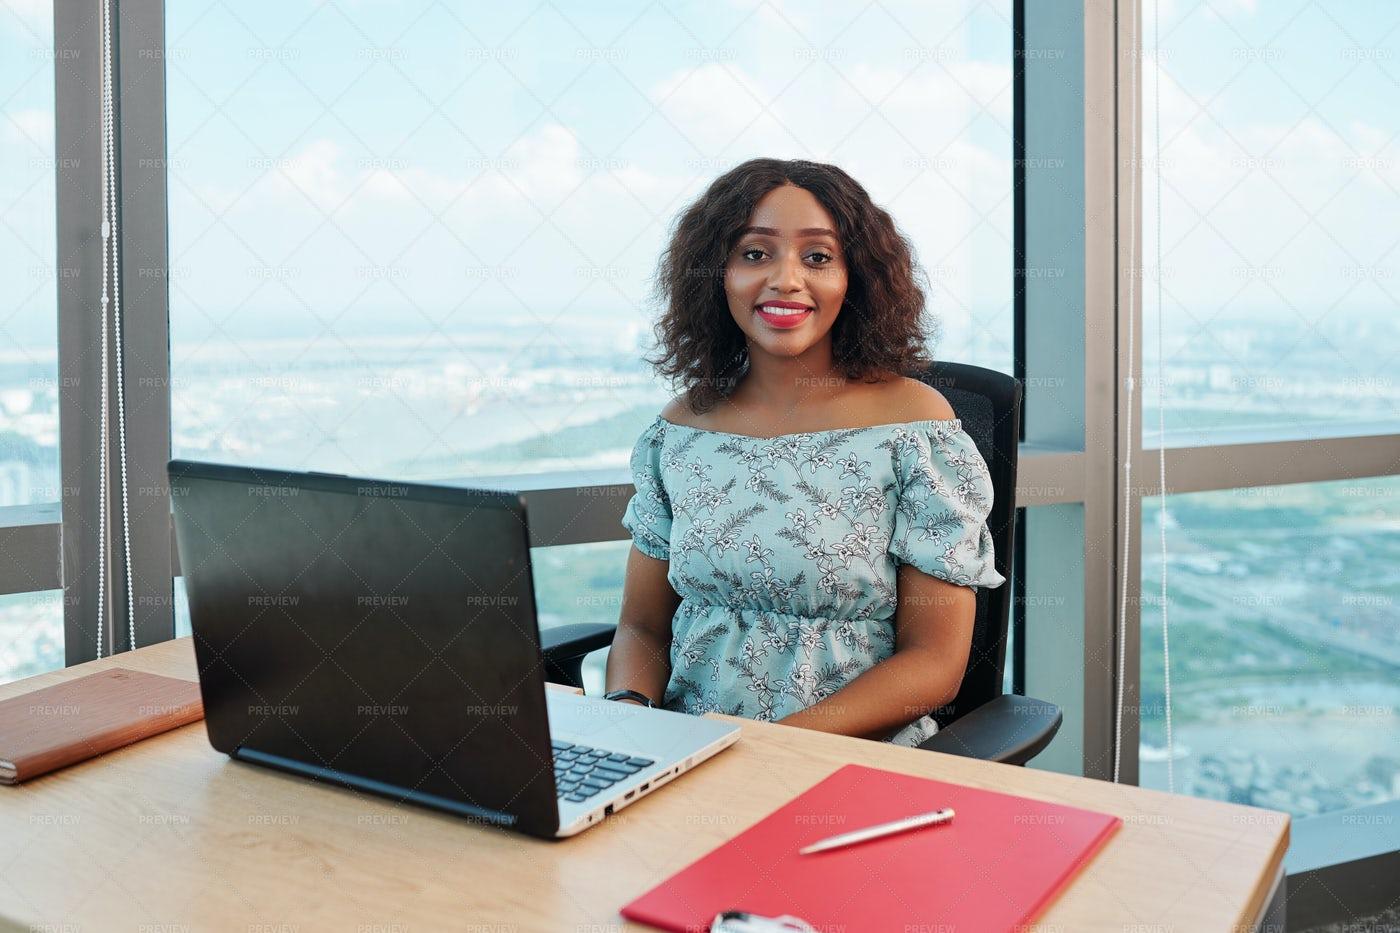 Businesswoman At Office Desk: Stock Photos